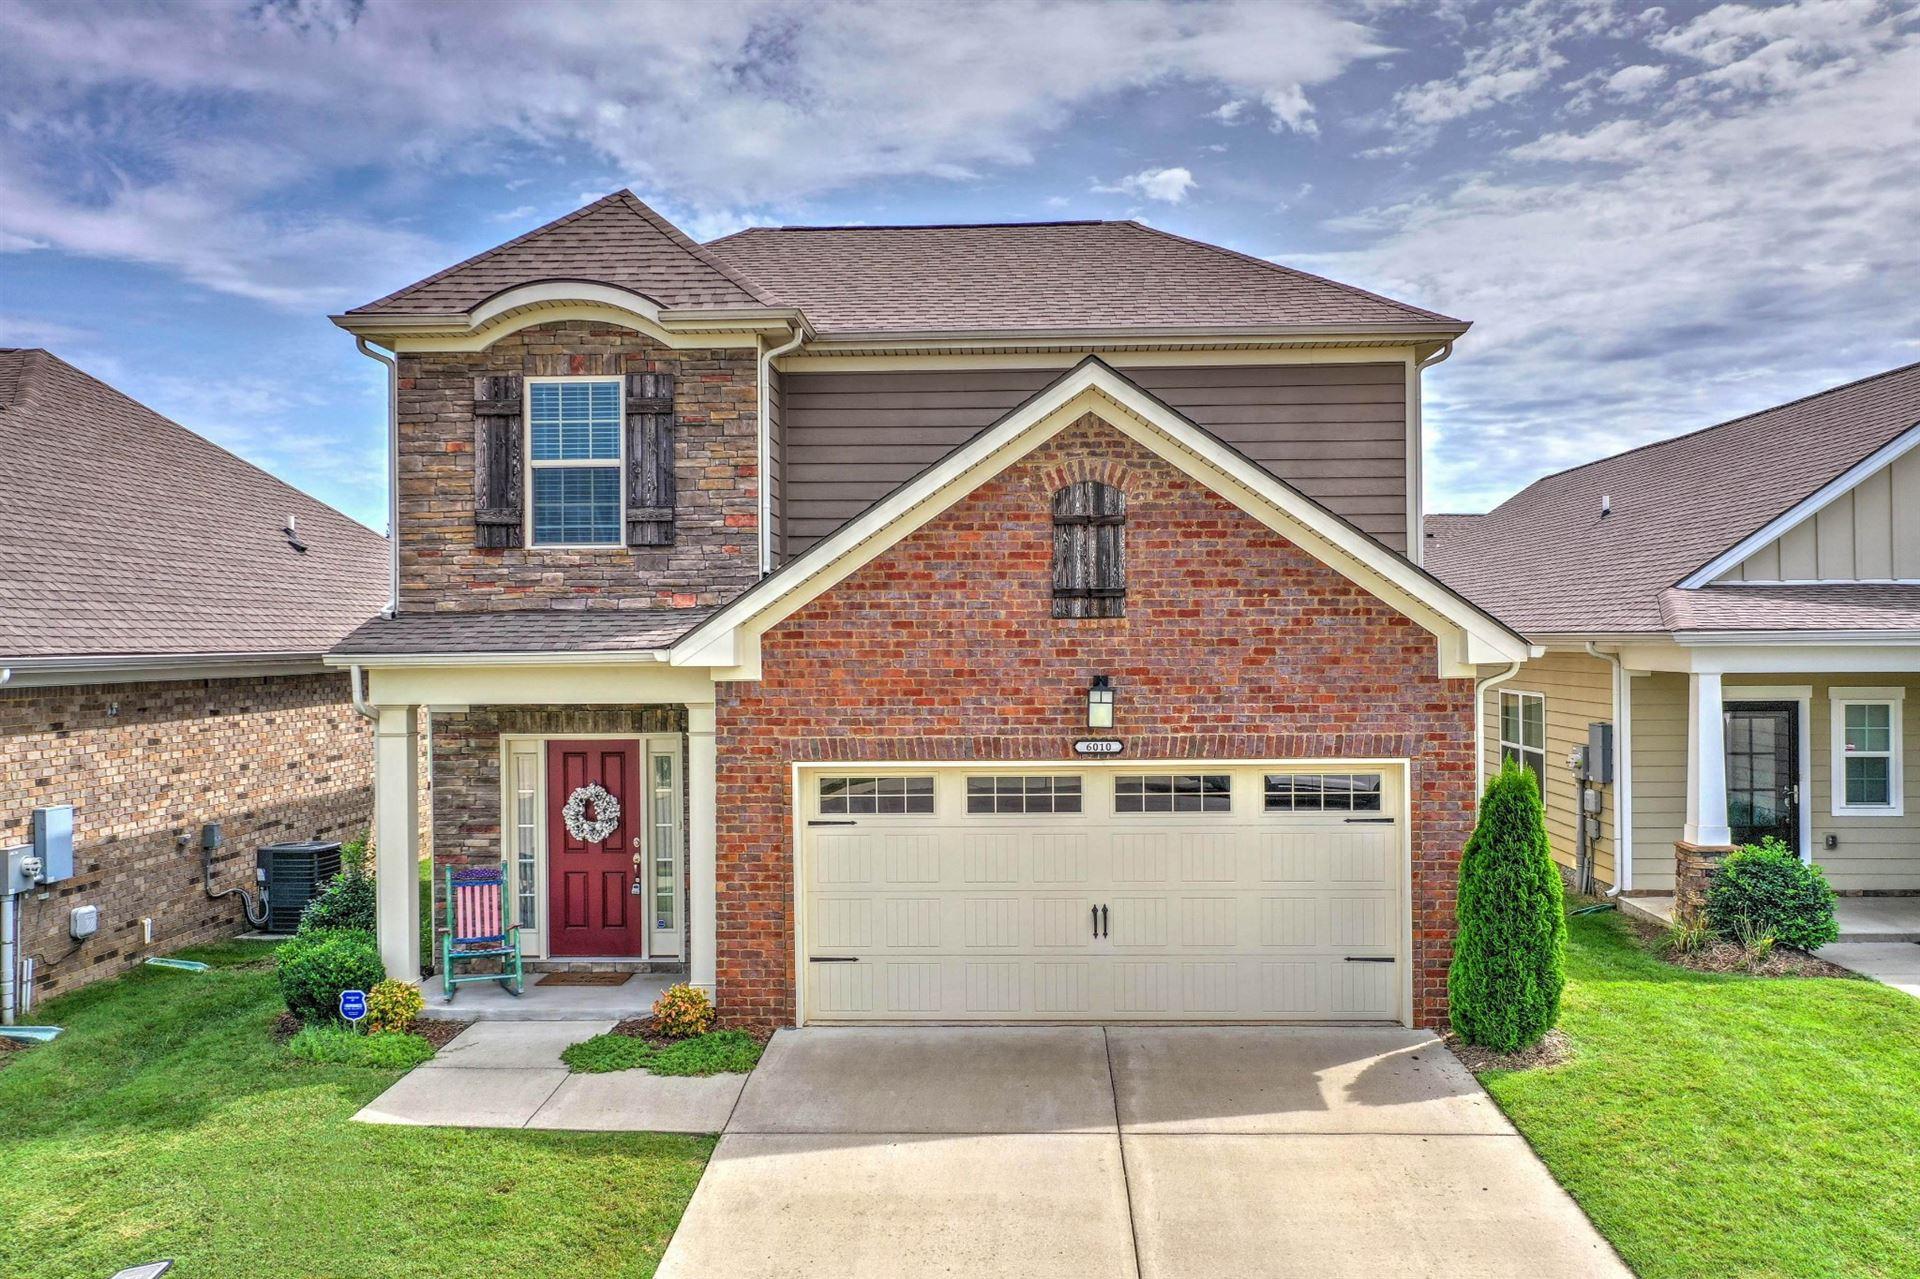 6010 Porterhouse Dr, Smyrna, TN 37167 - MLS#: 2190115